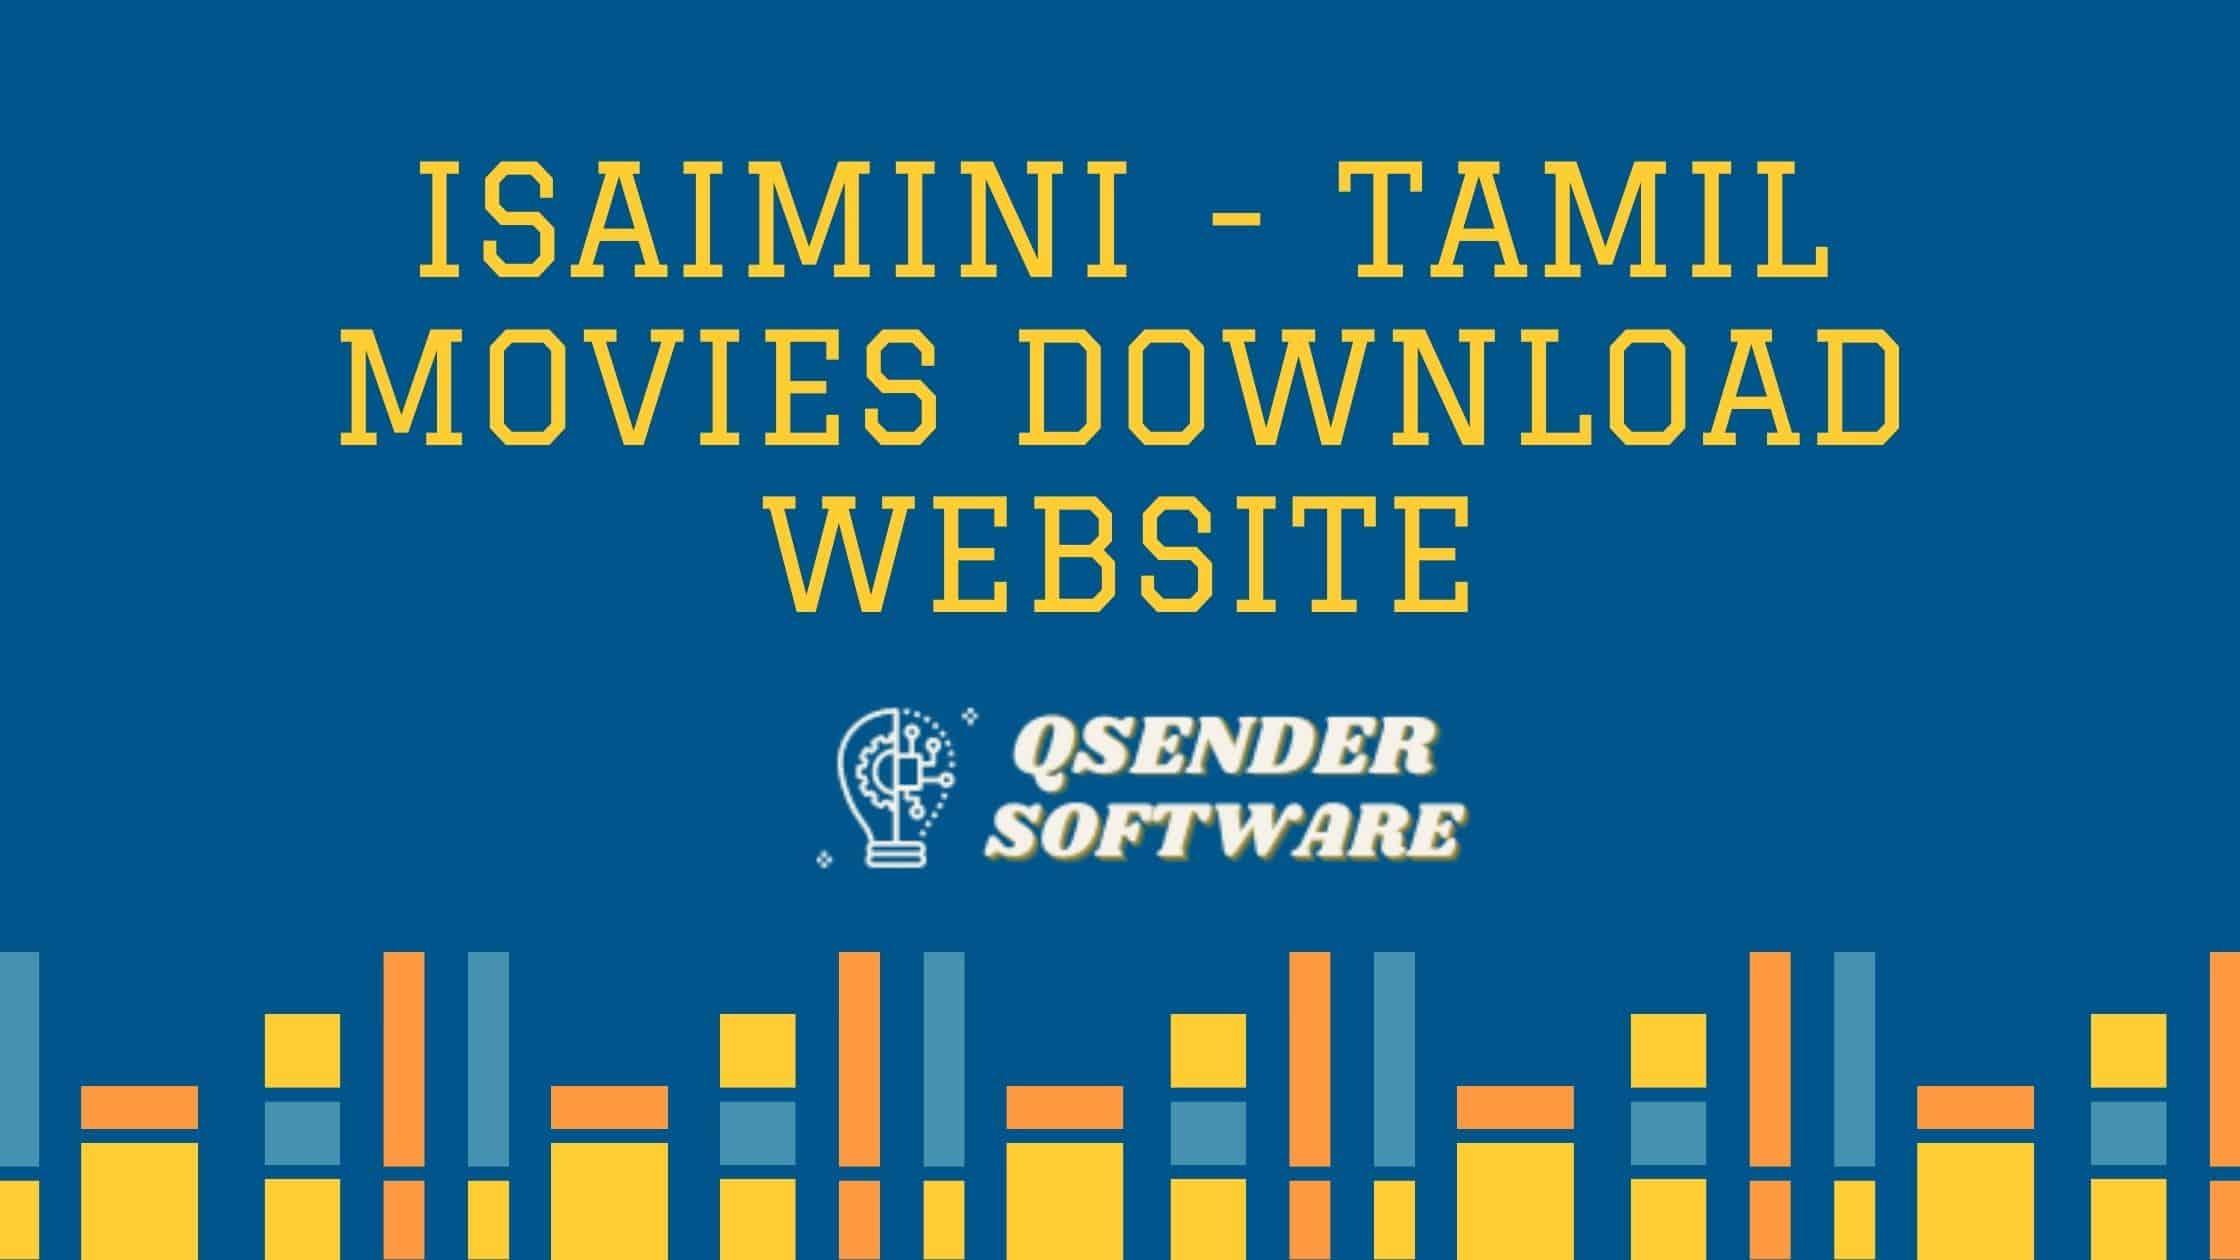 Isaimini – Tamil Movies Download Website